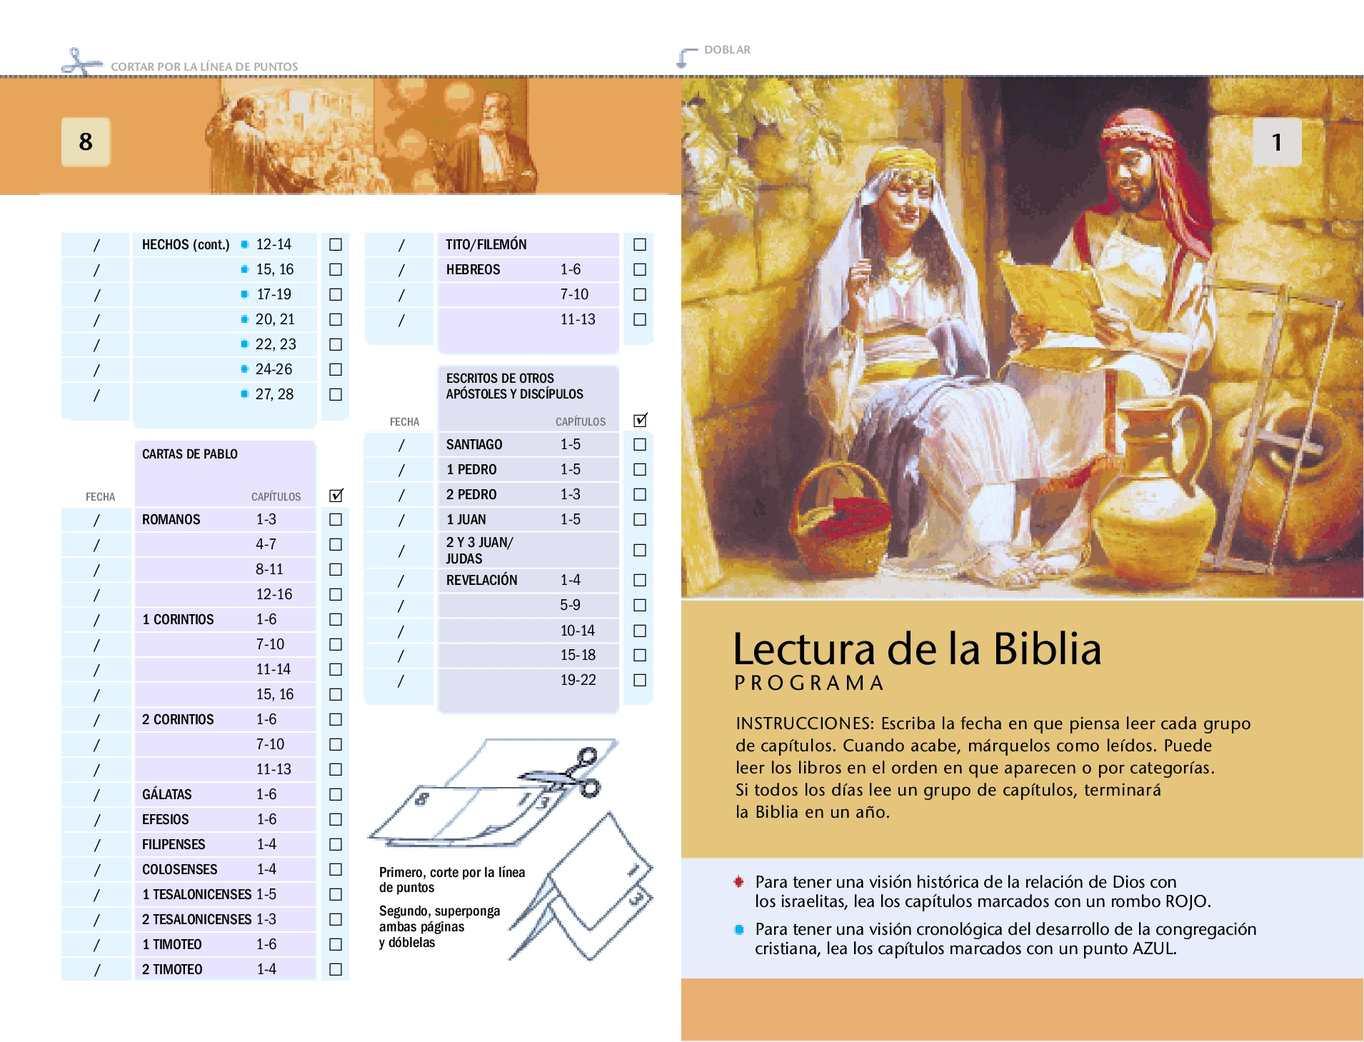 programa de lectura de la biblia